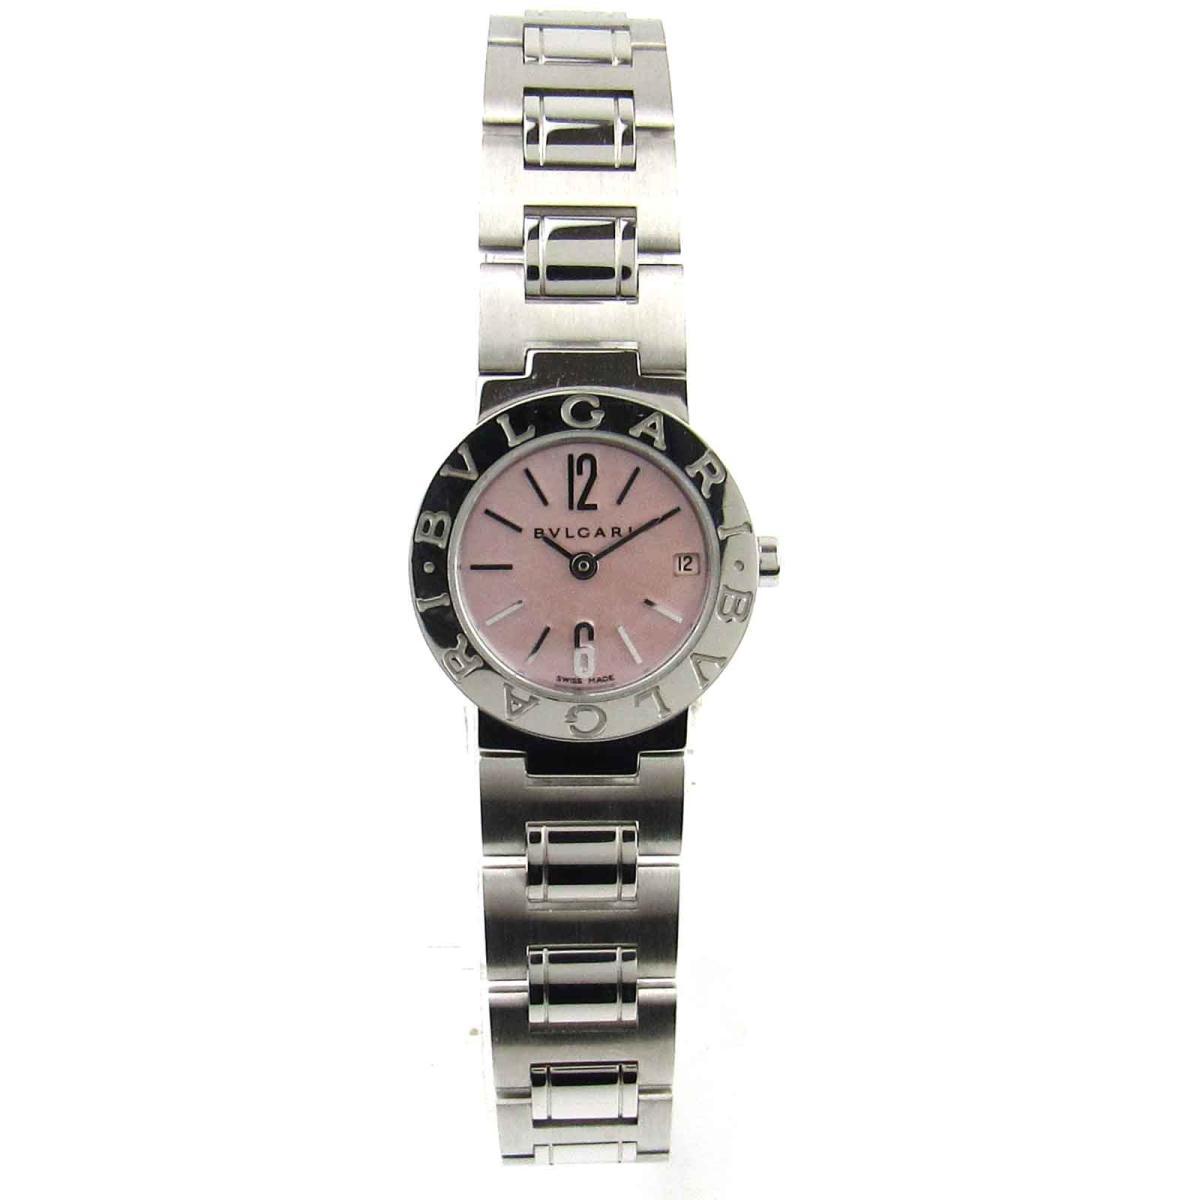 BVLGARI 時計 BB23SS ブルガリ ブルガリ ウォッチ 腕時計